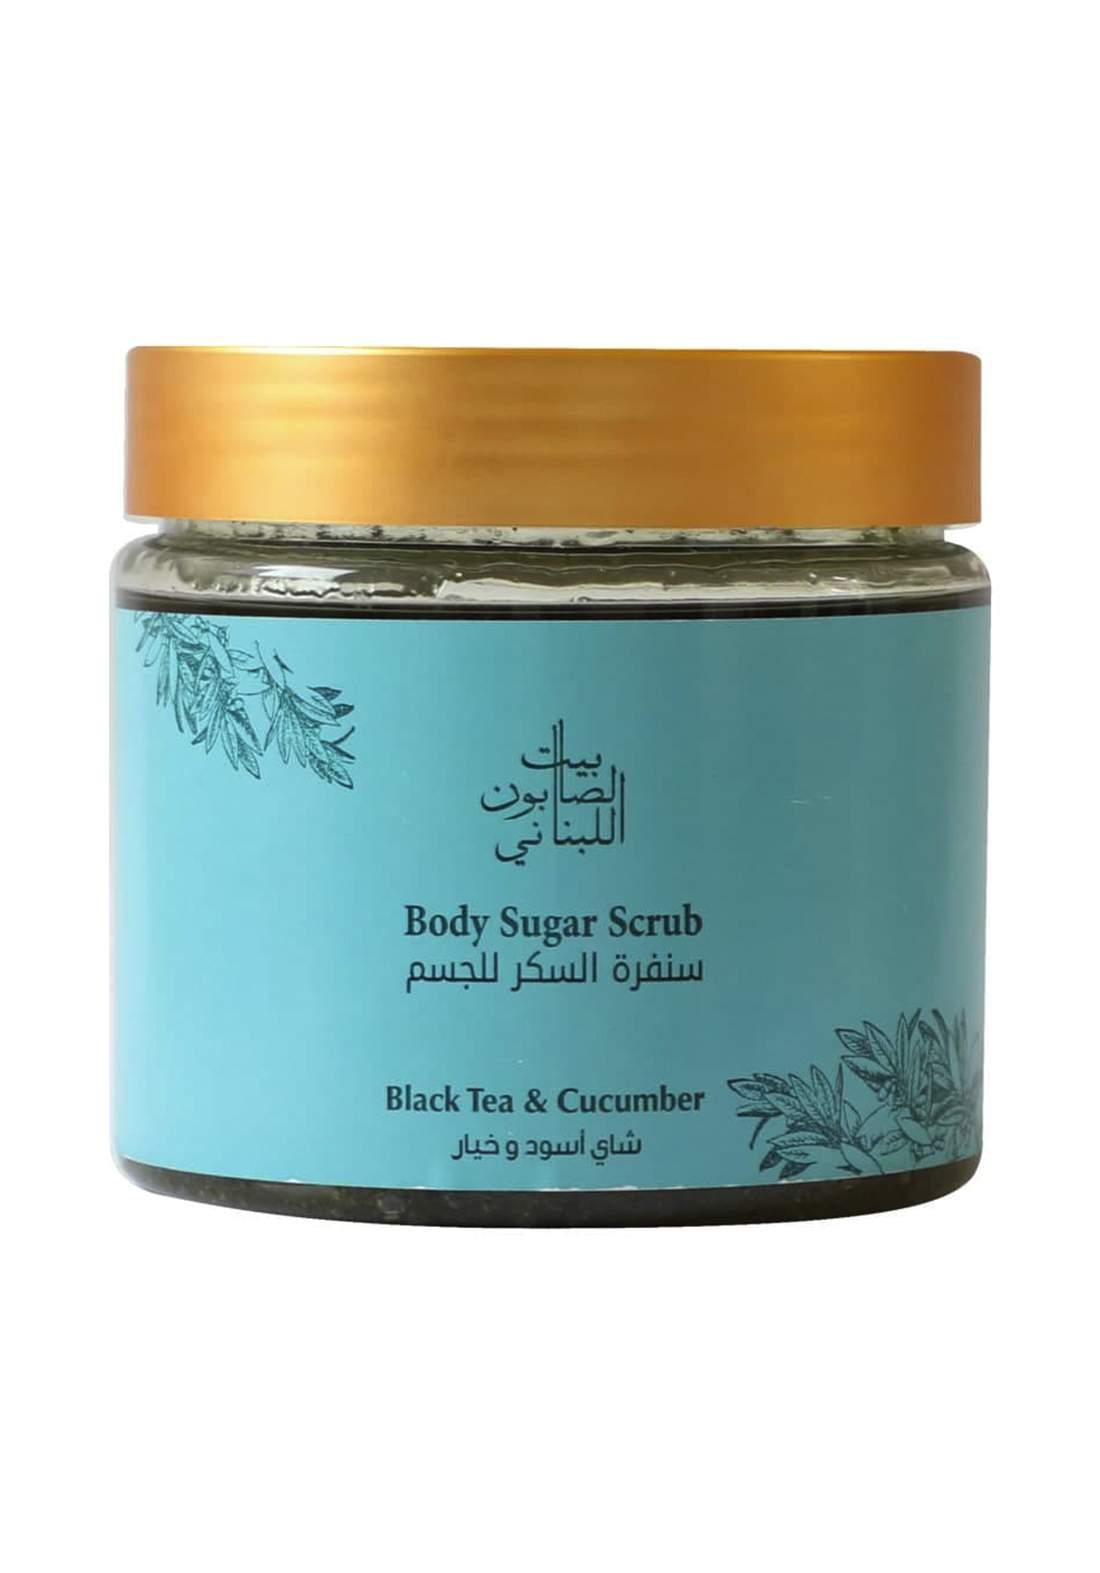 Bayt Alsaboun Alloubnani-320716 Body Sugar Scrub Blacktea&Cucumber 500g سنفرة